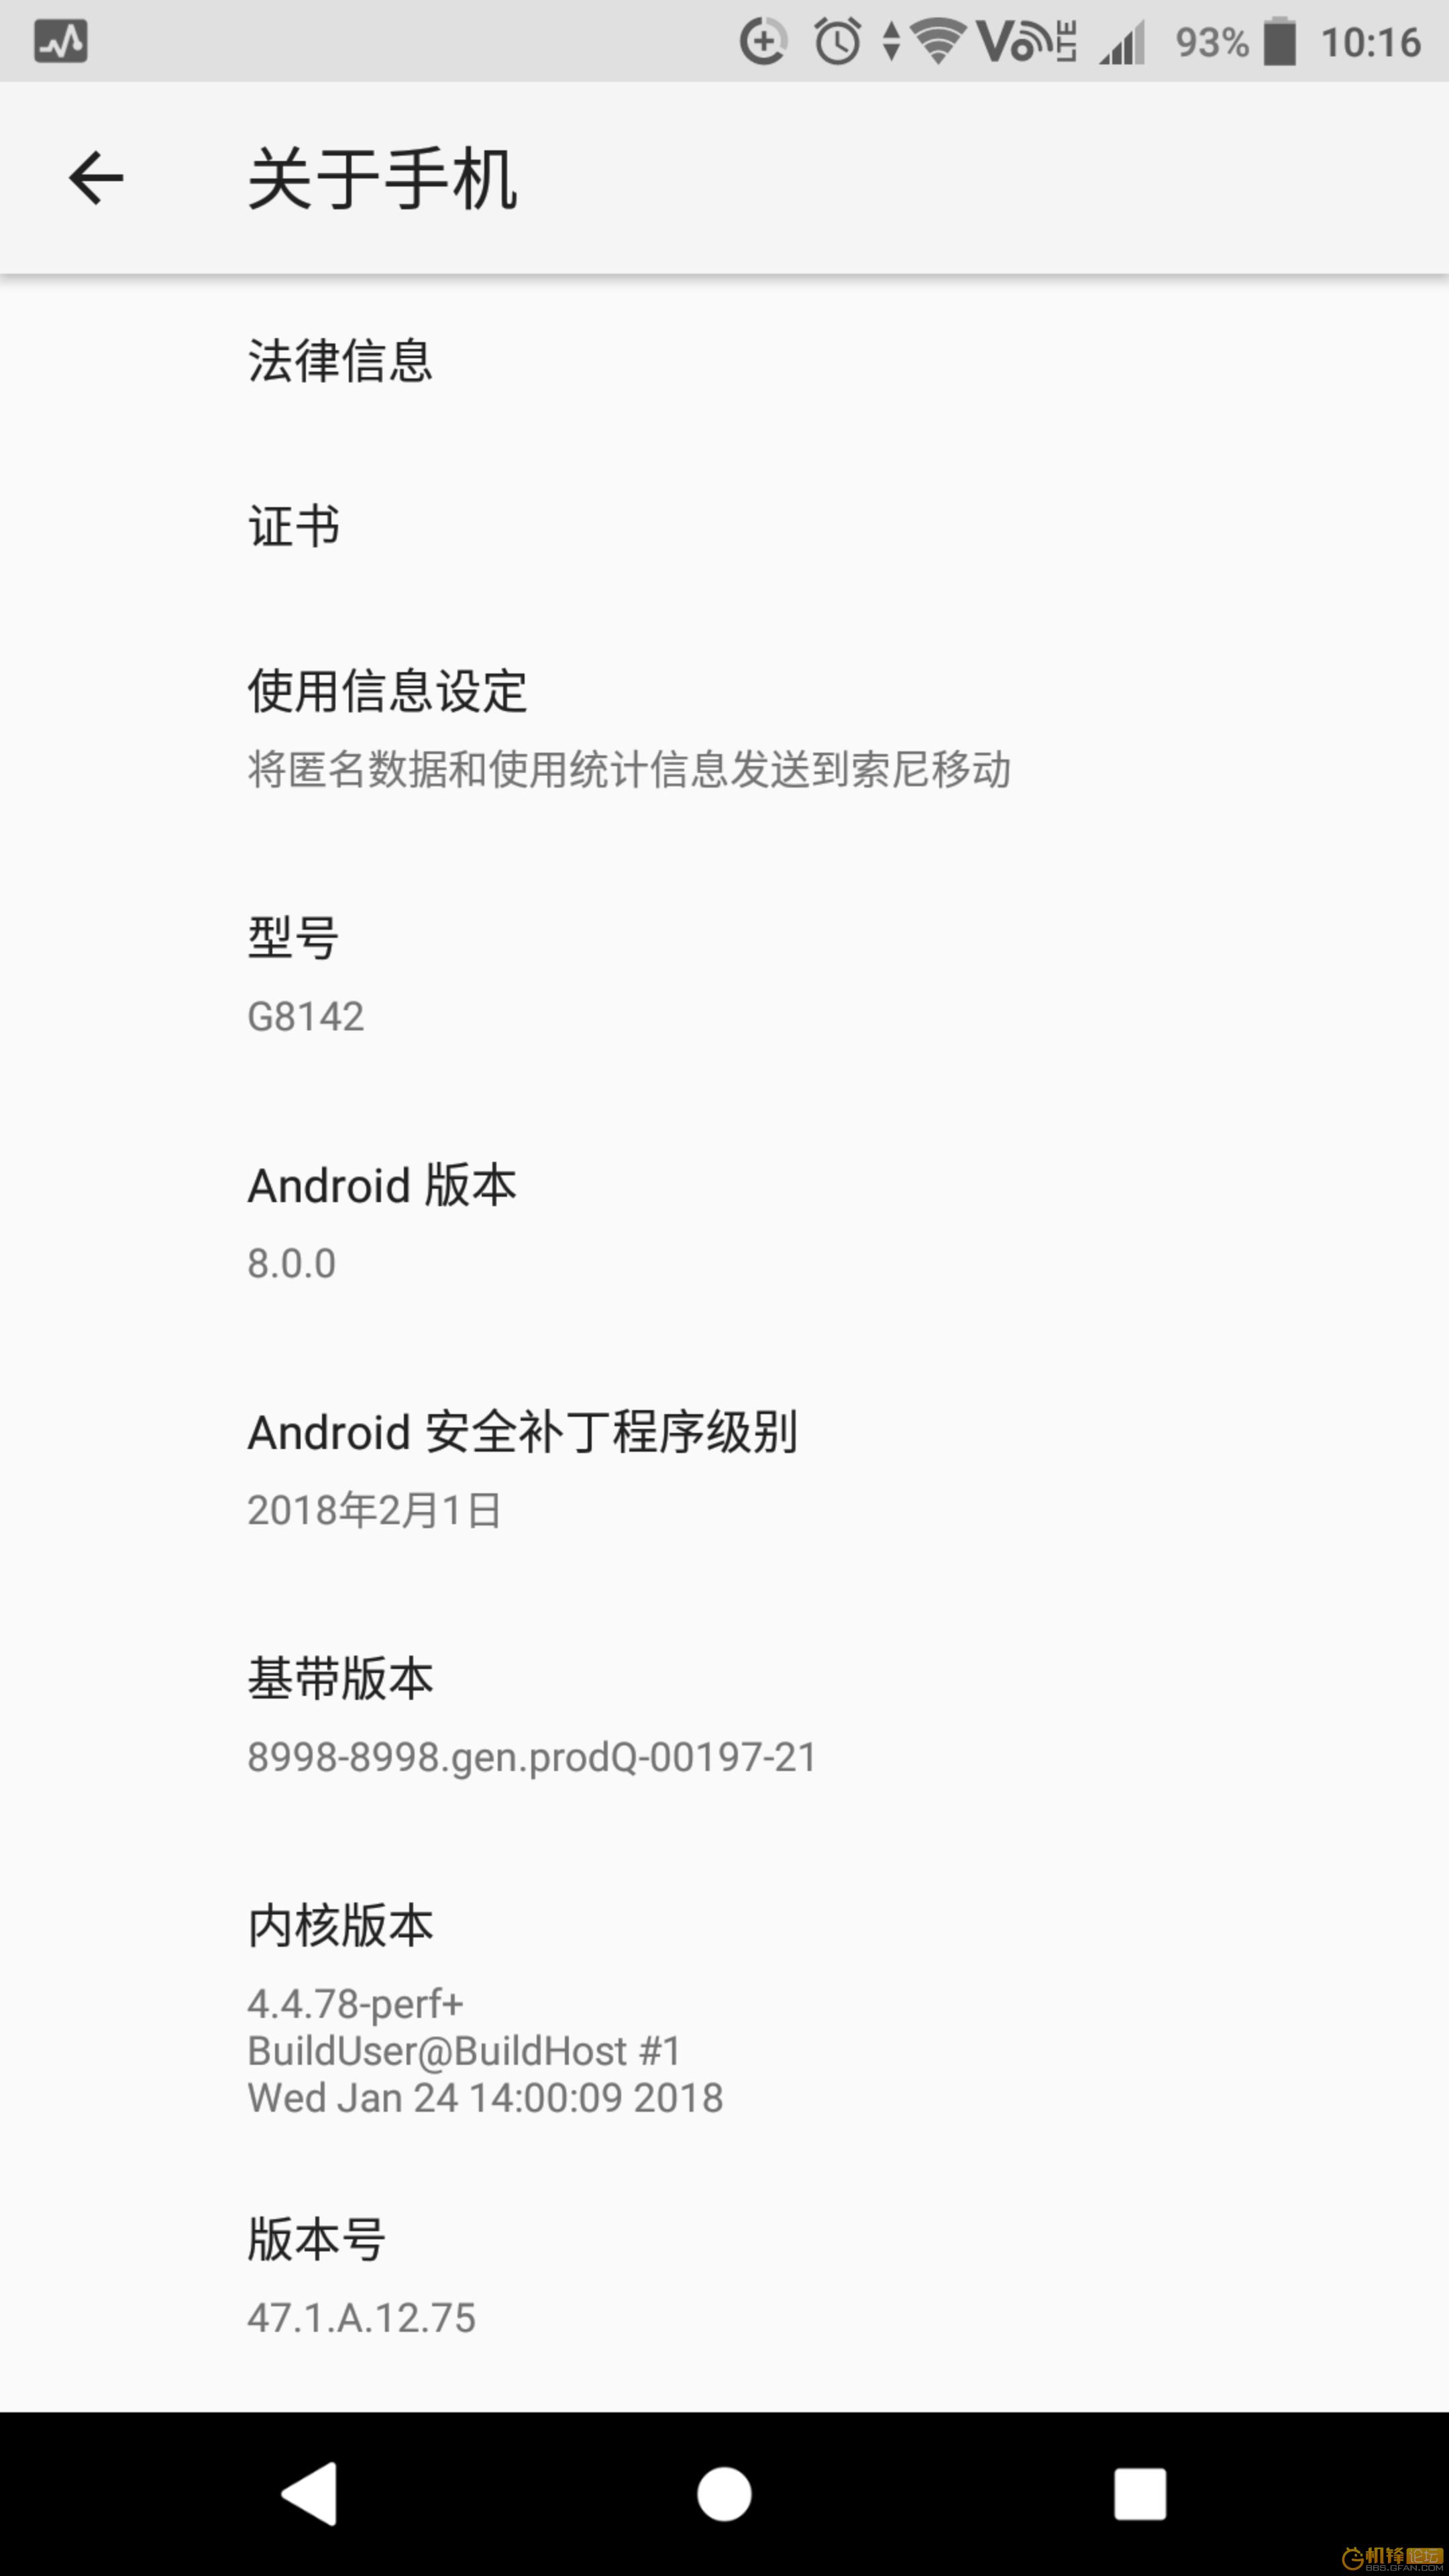 QQ图片20180214104600.png